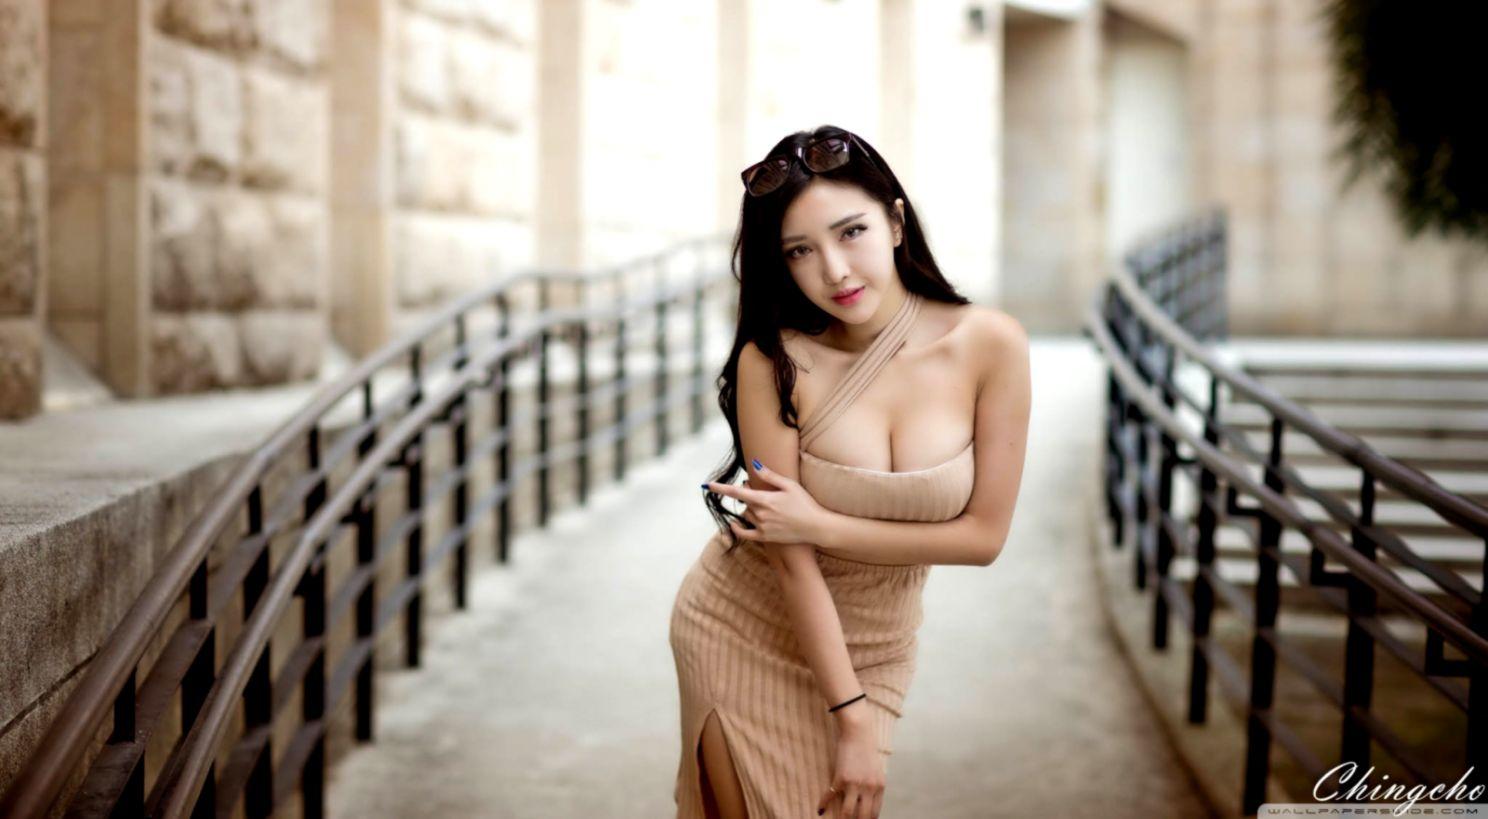 Asian Brunette Girl Hd Wallpaper Wallpapers App